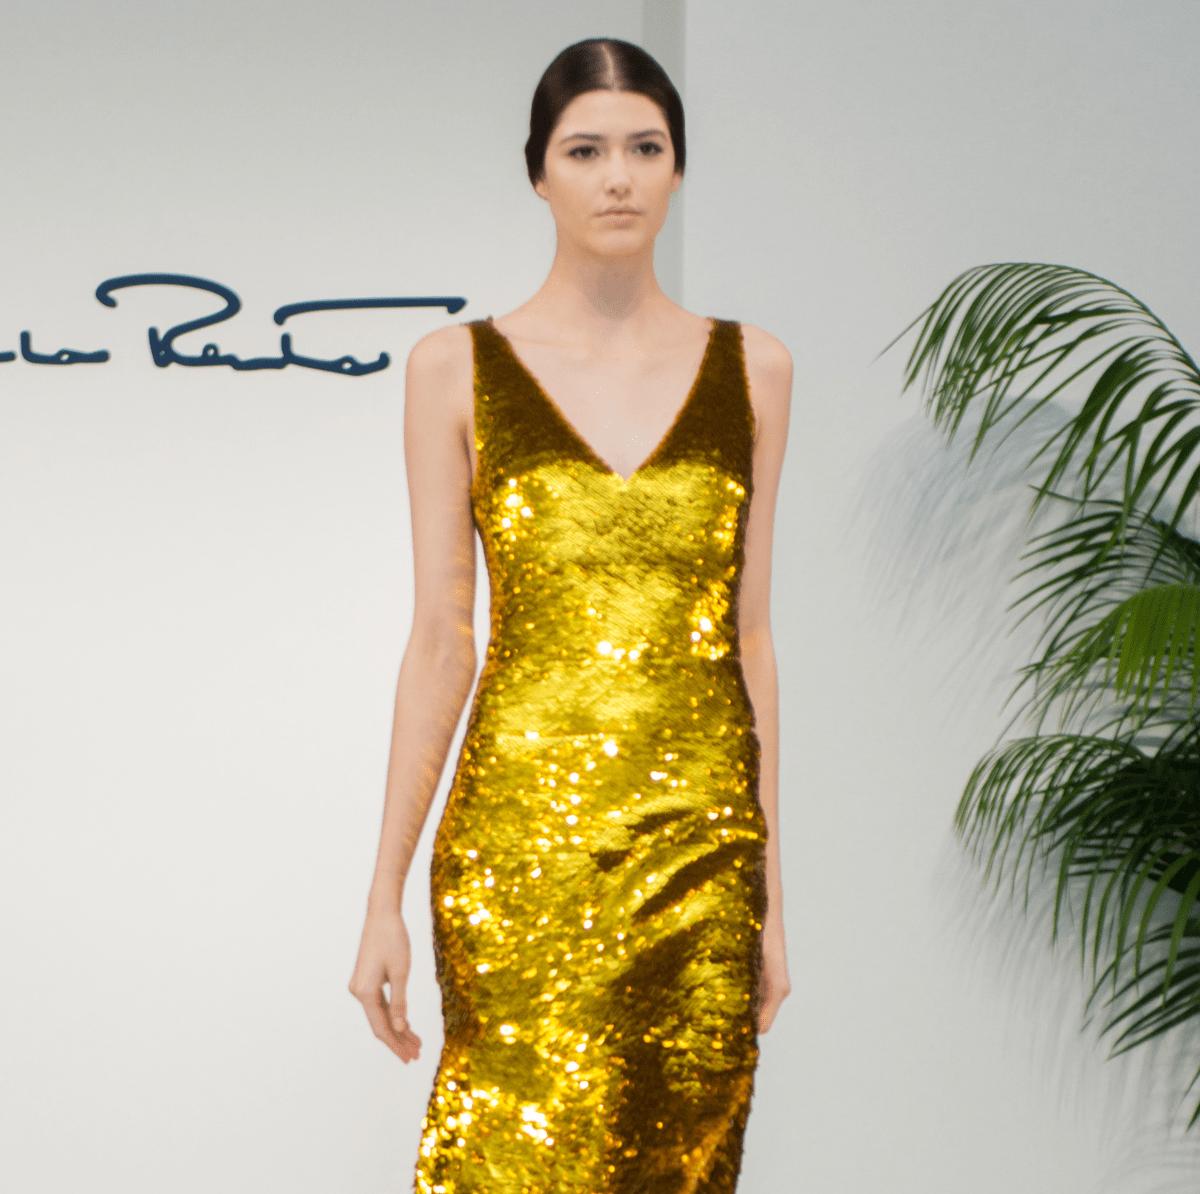 Oscar de la Renta 2018 resort collection gold gown